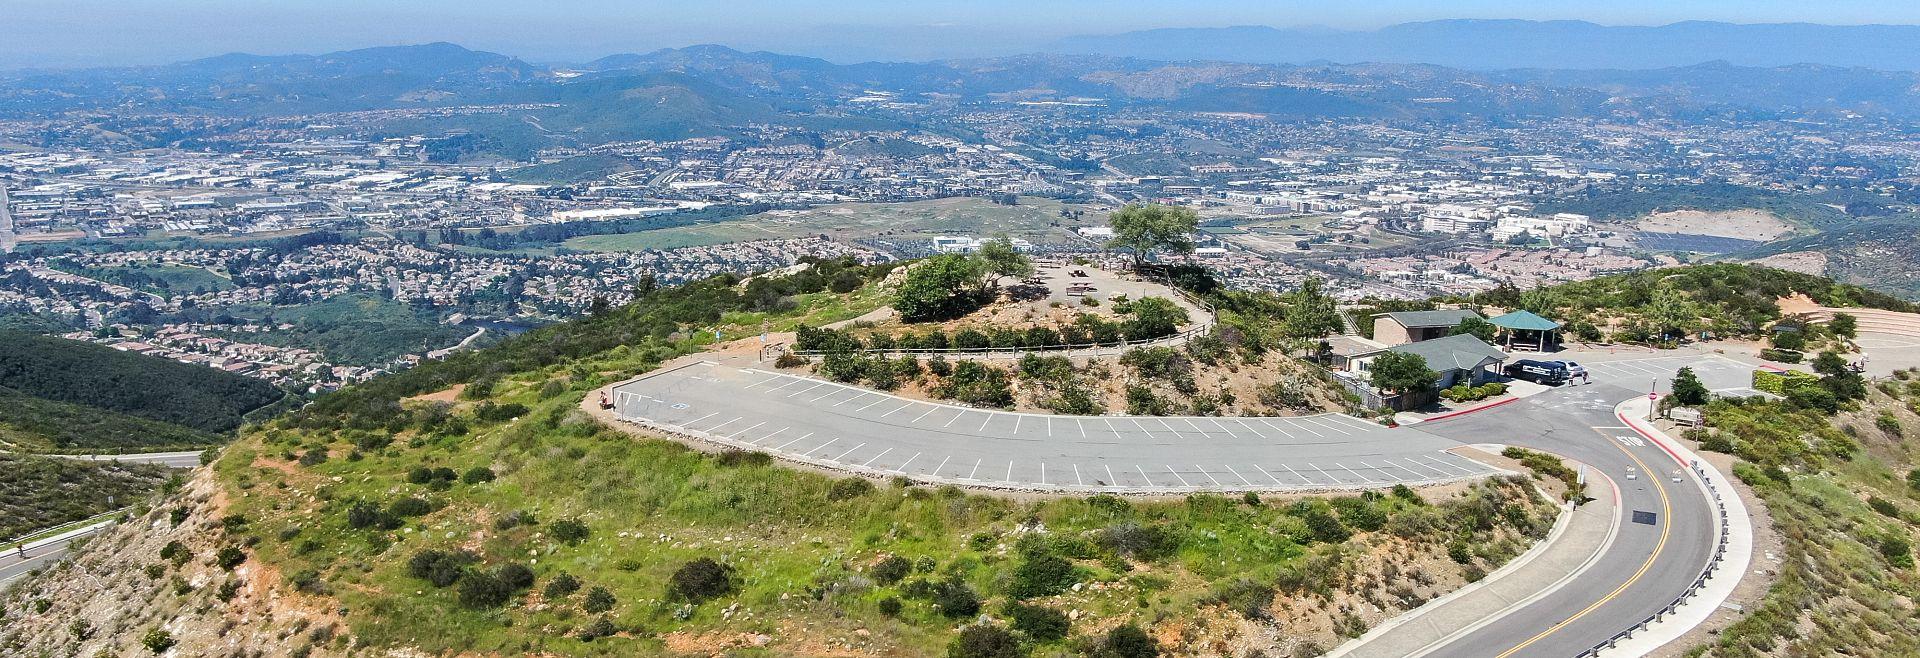 Double Peak Park in San Marcos, CA